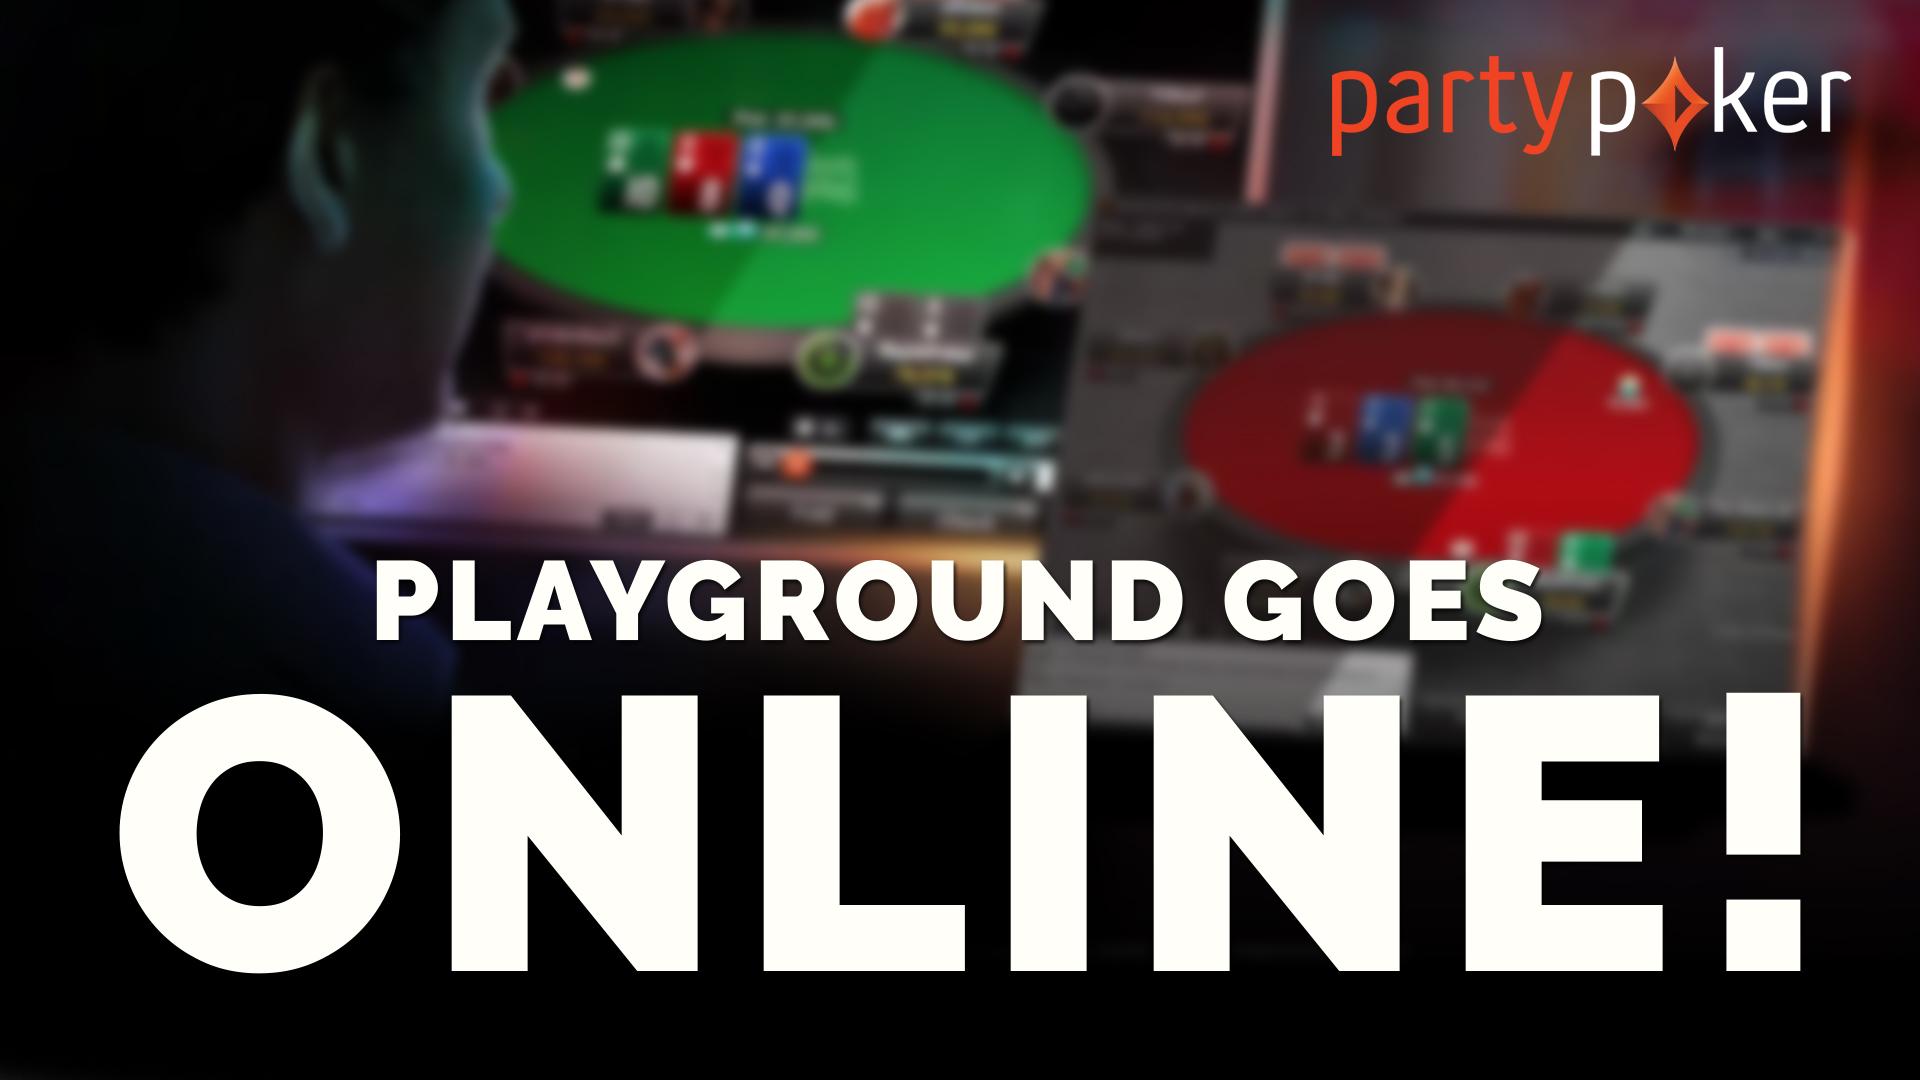 Playground goes online!